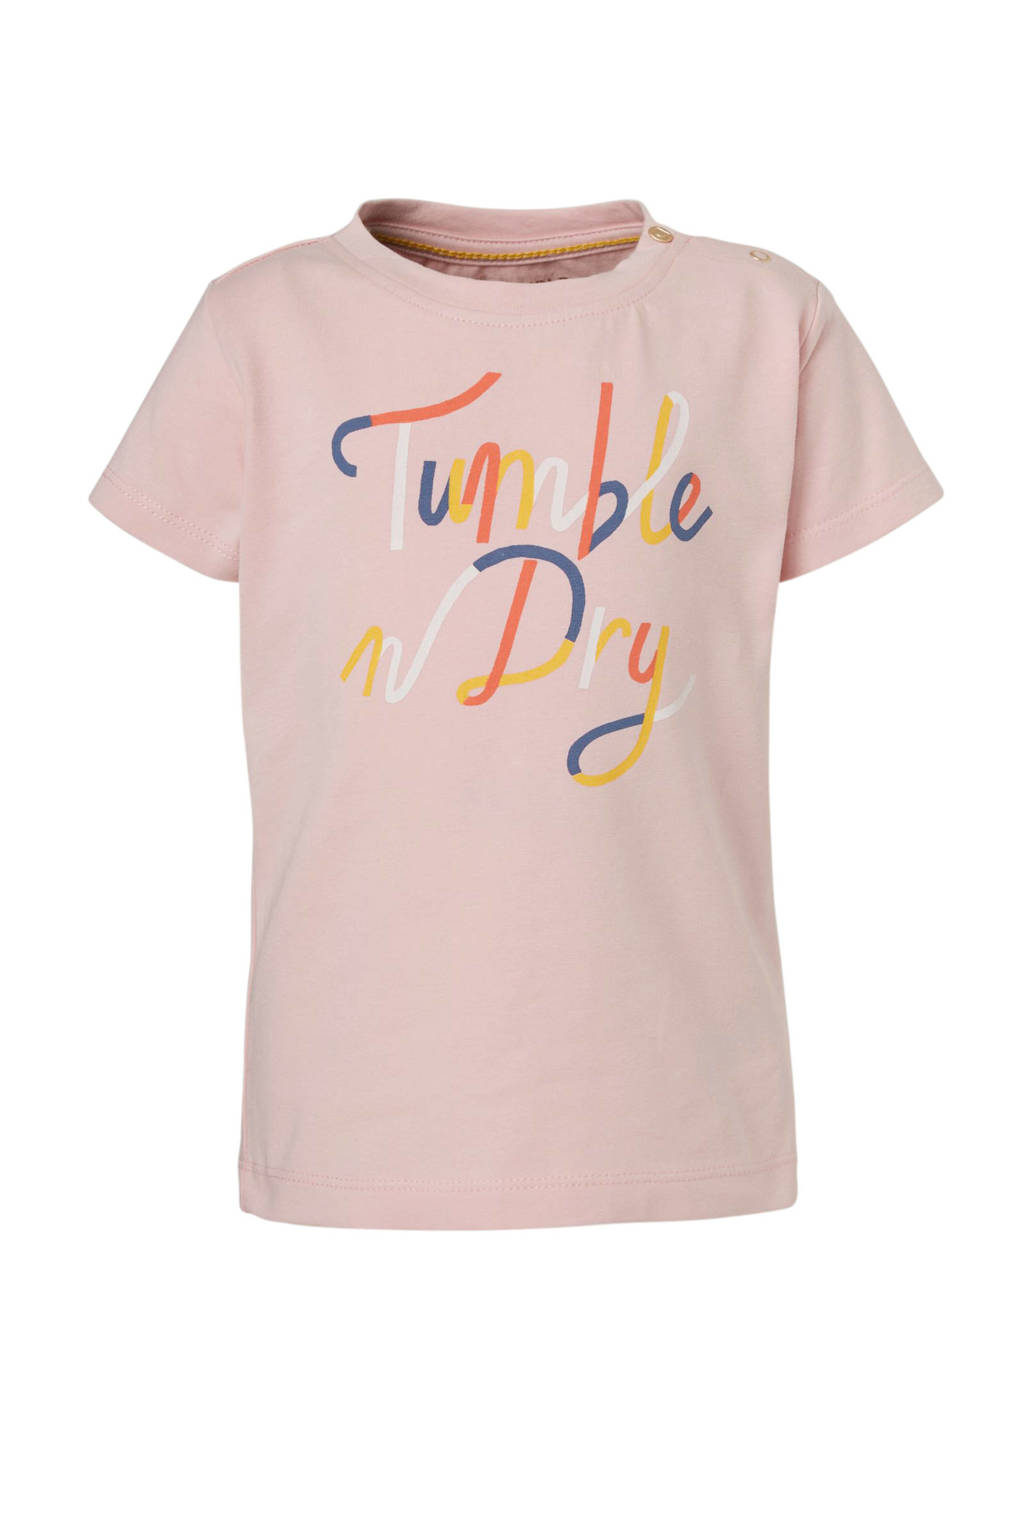 Tumble 'n Dry Lo regular fit T-shirt Myrte met tekst lichtroze/multi, Lichtroze/multi